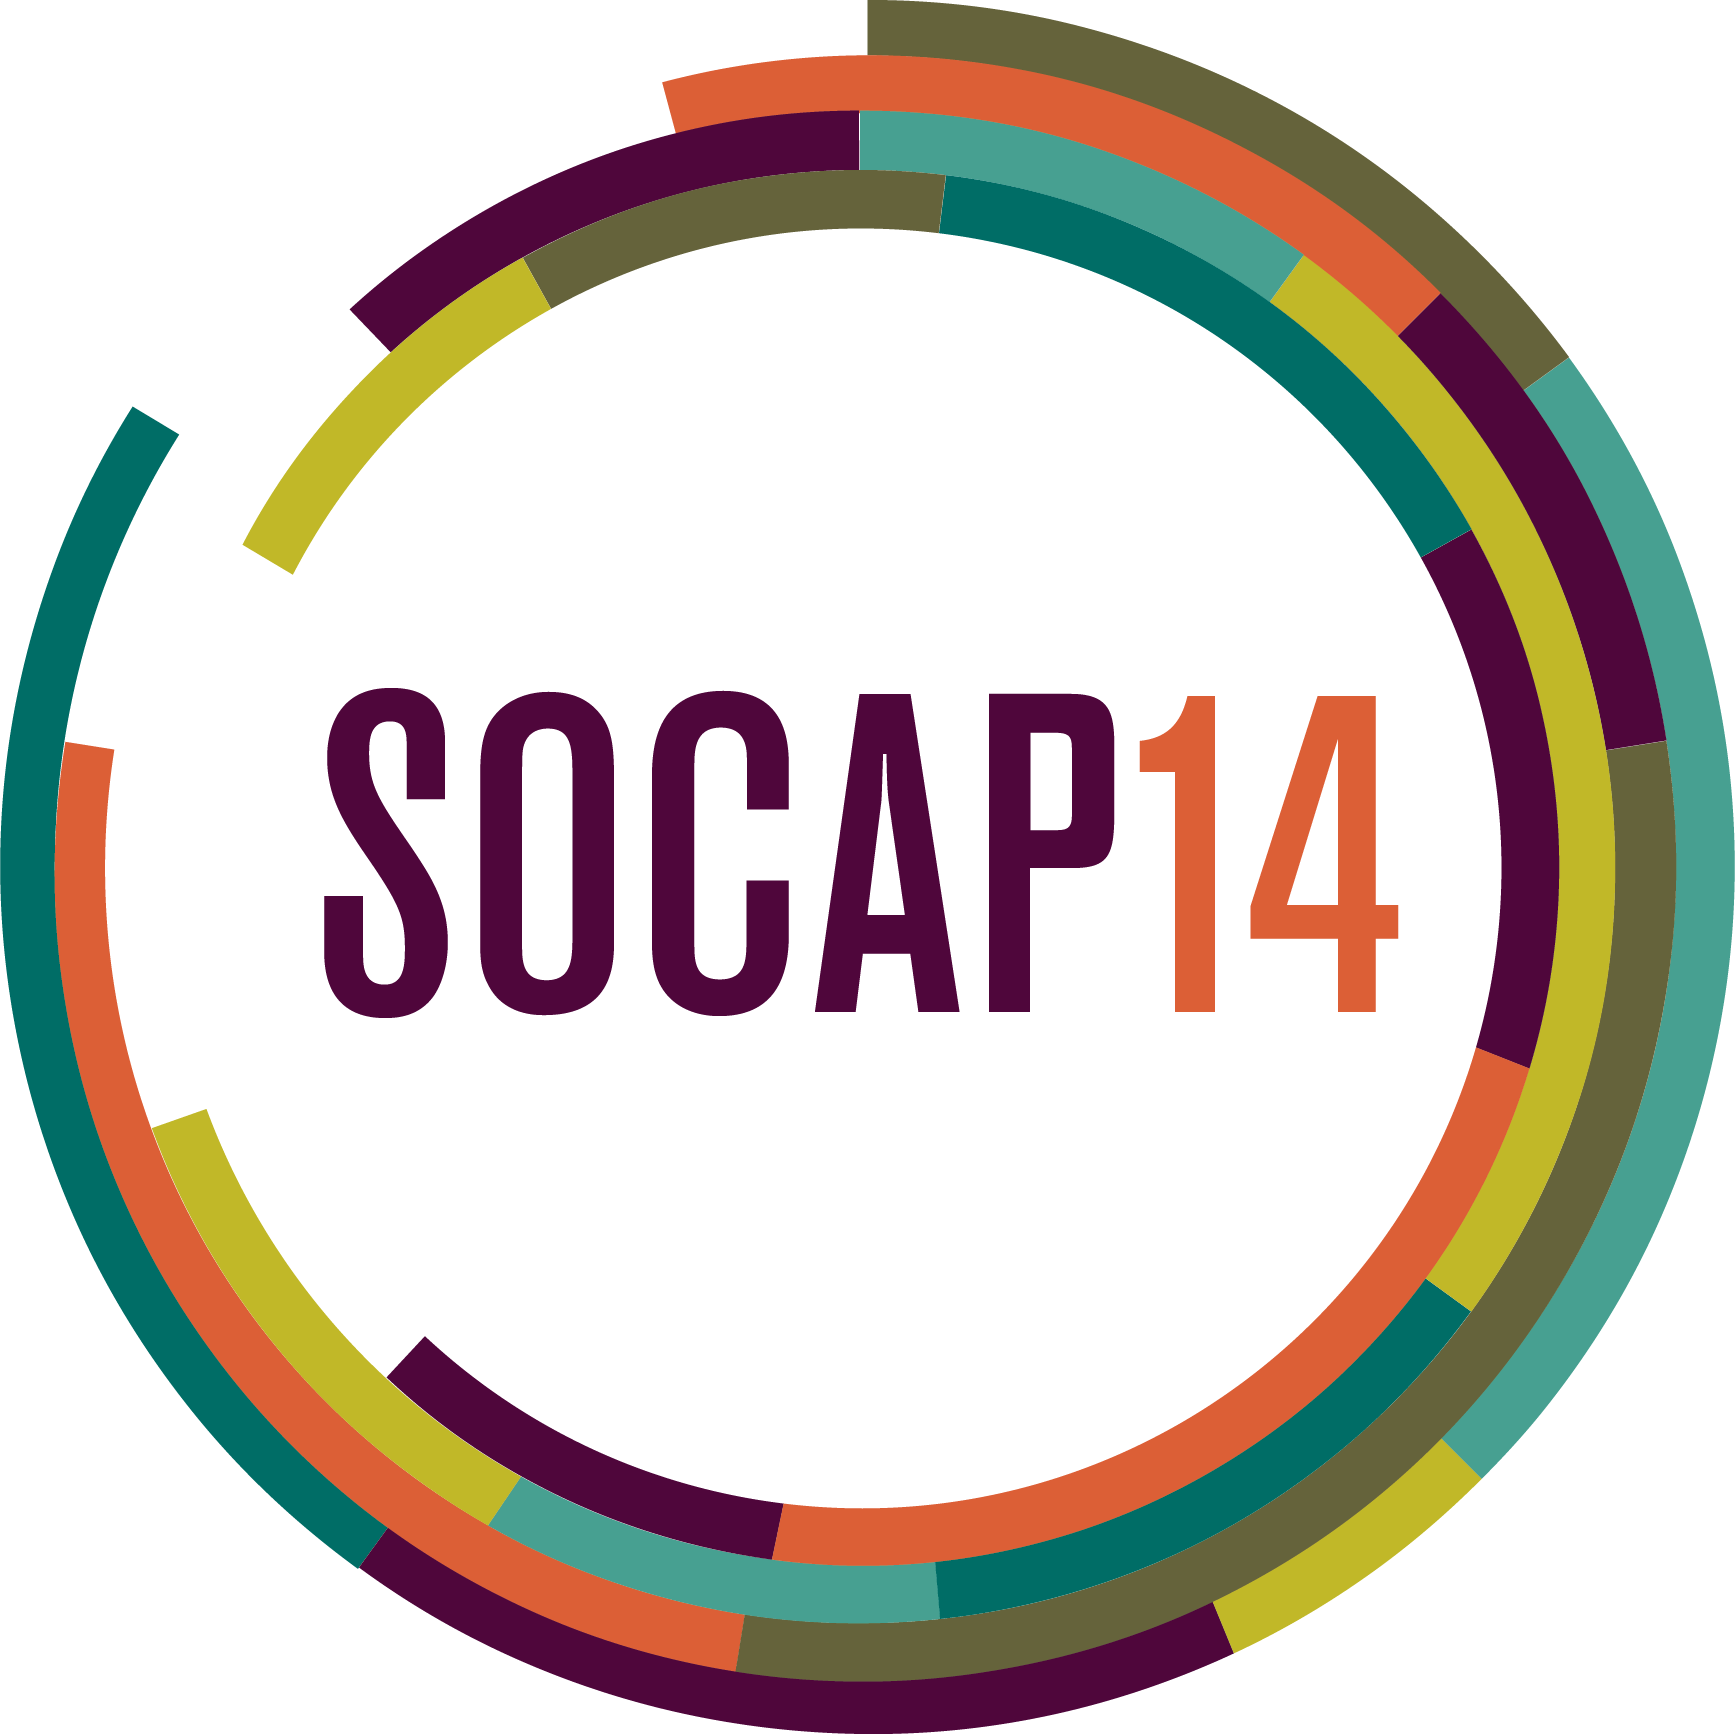 SOCAP-14-Logo-1